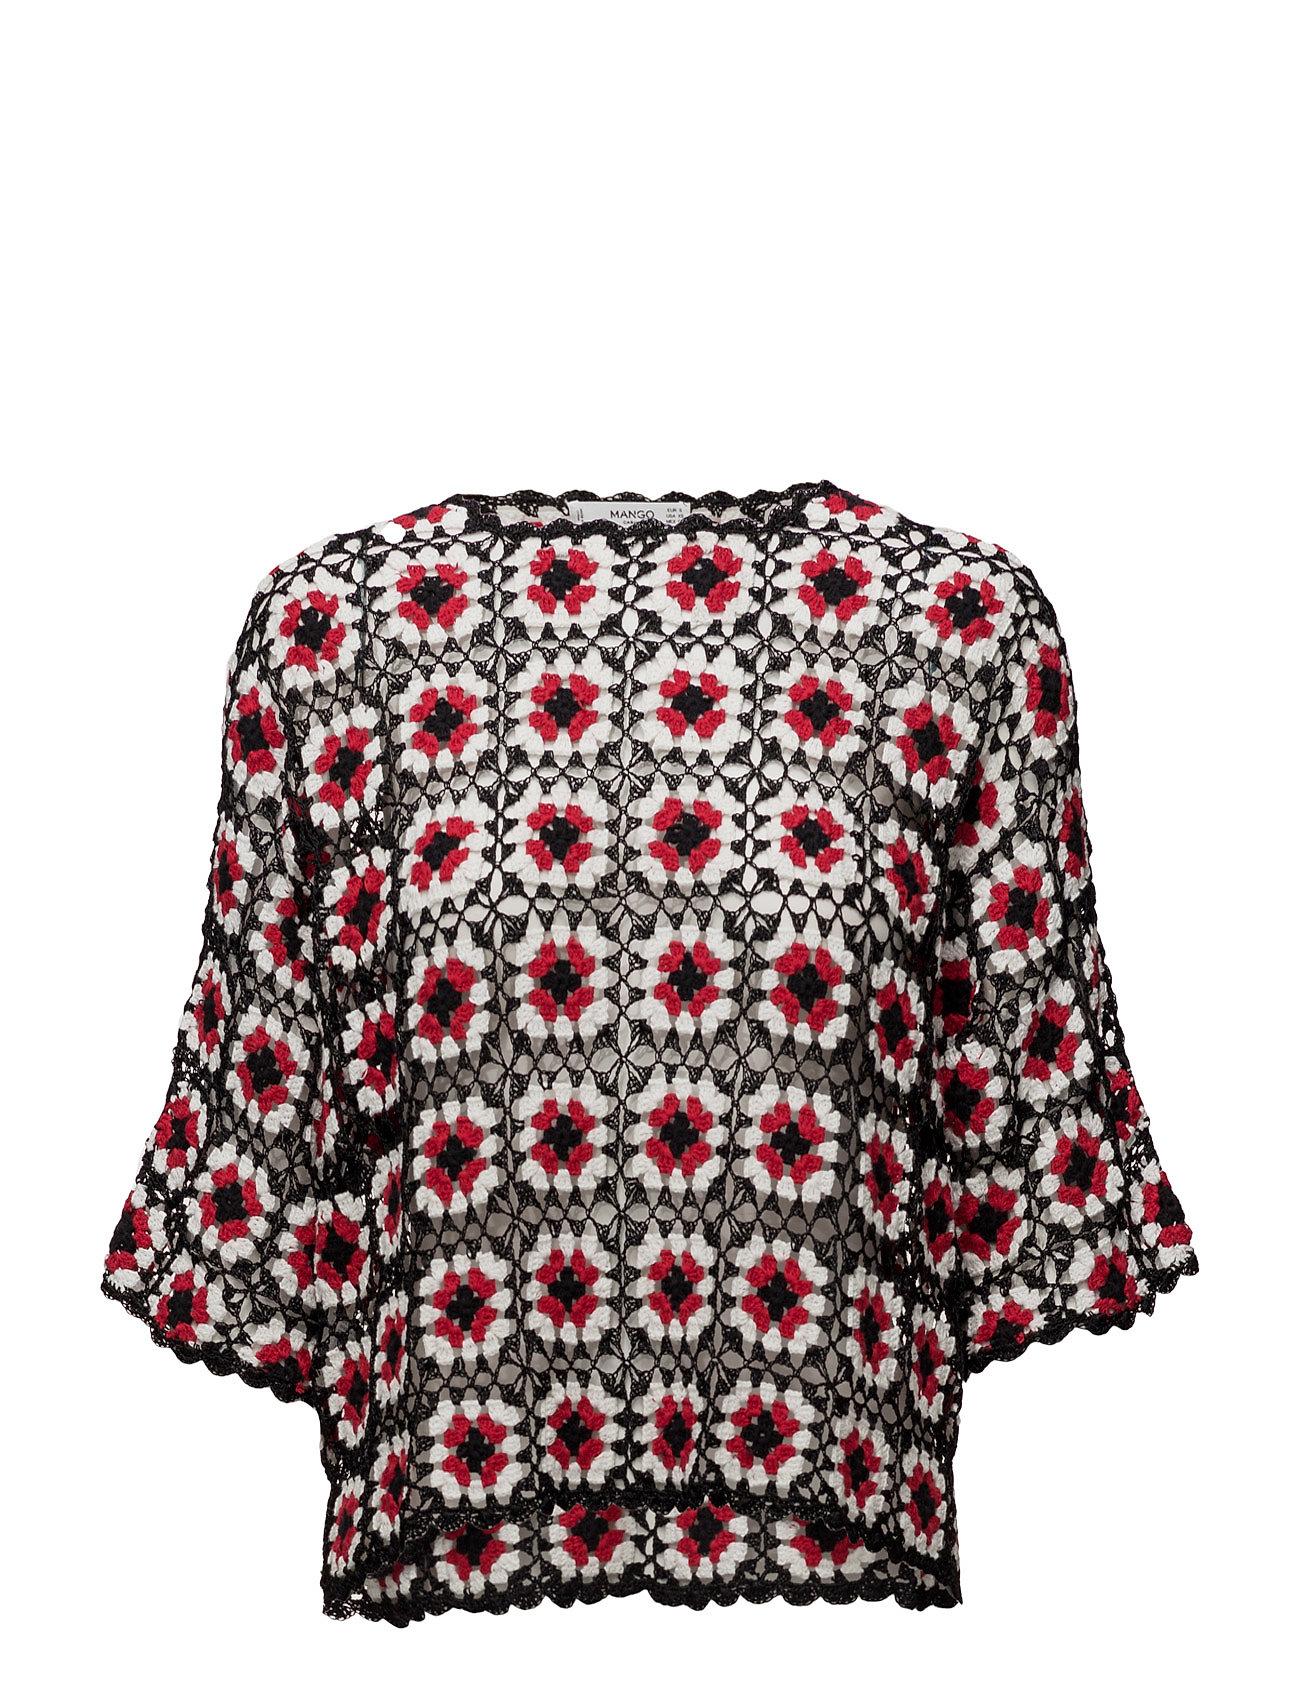 Tricolor Openwork Sweater Mango Sweatshirts til Damer i Sort